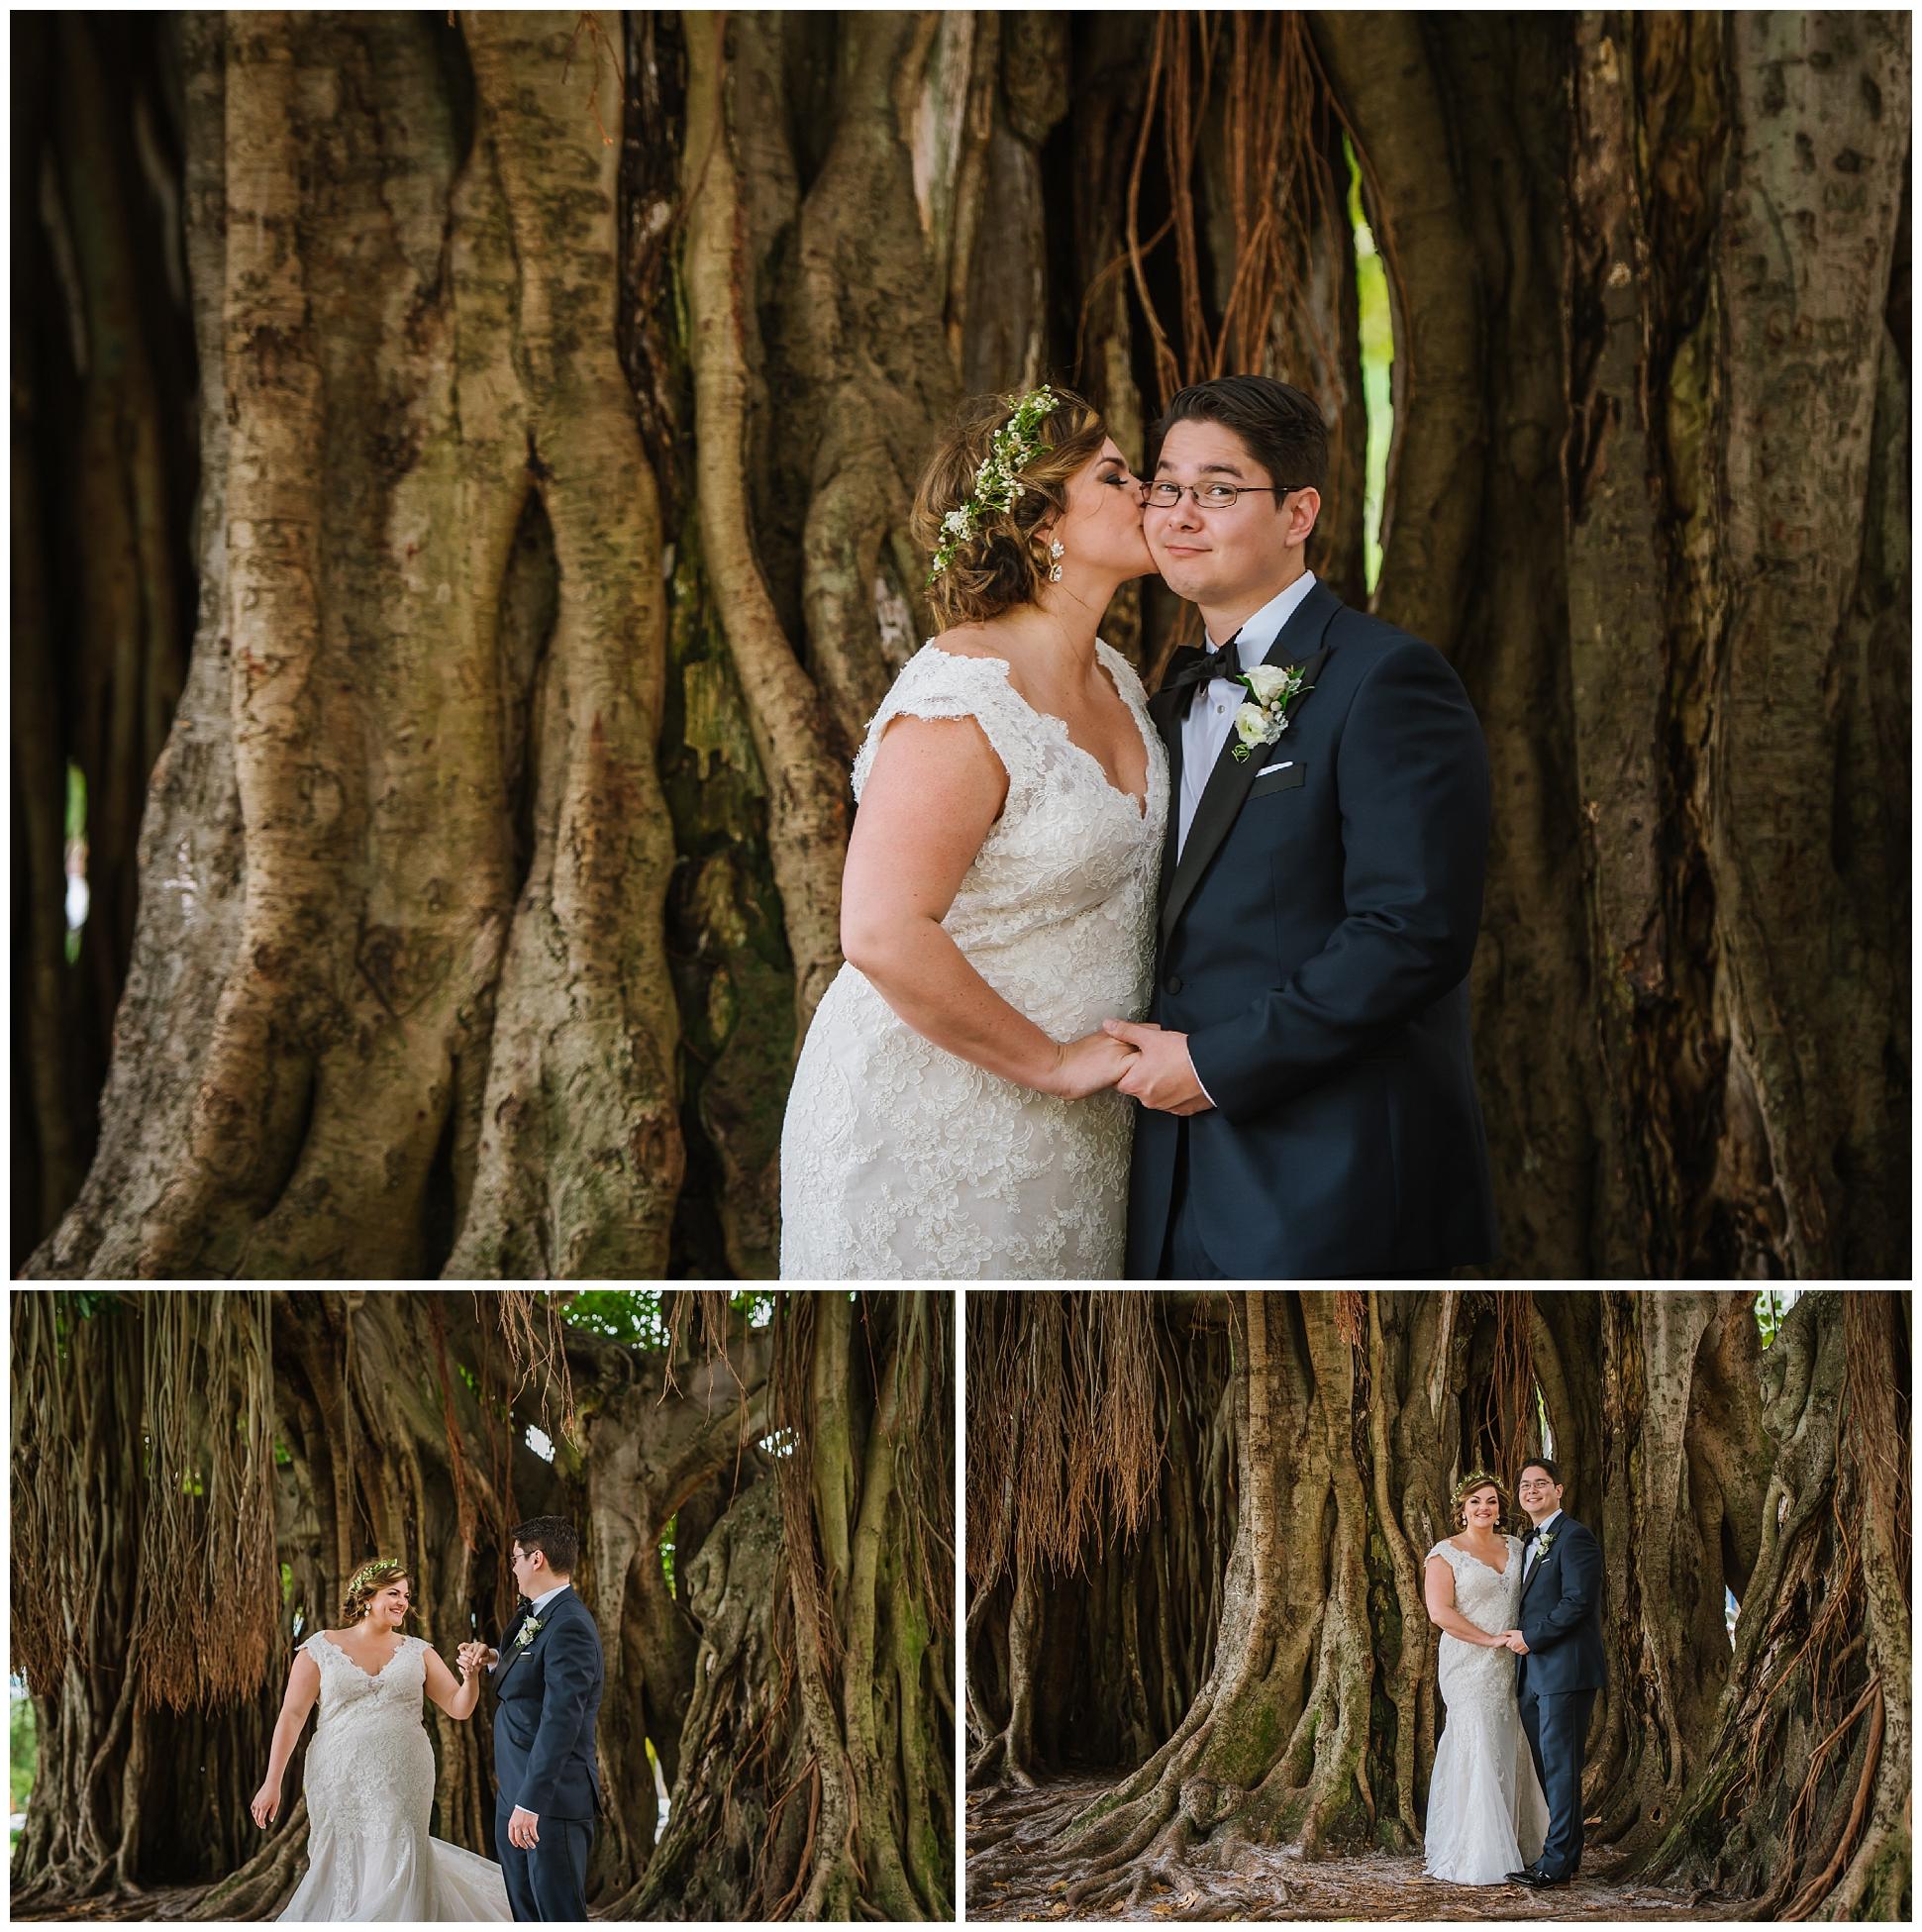 st-pete-wedding-photographer-italian-romance-theme-rustic-flower-crown_0424.jpg